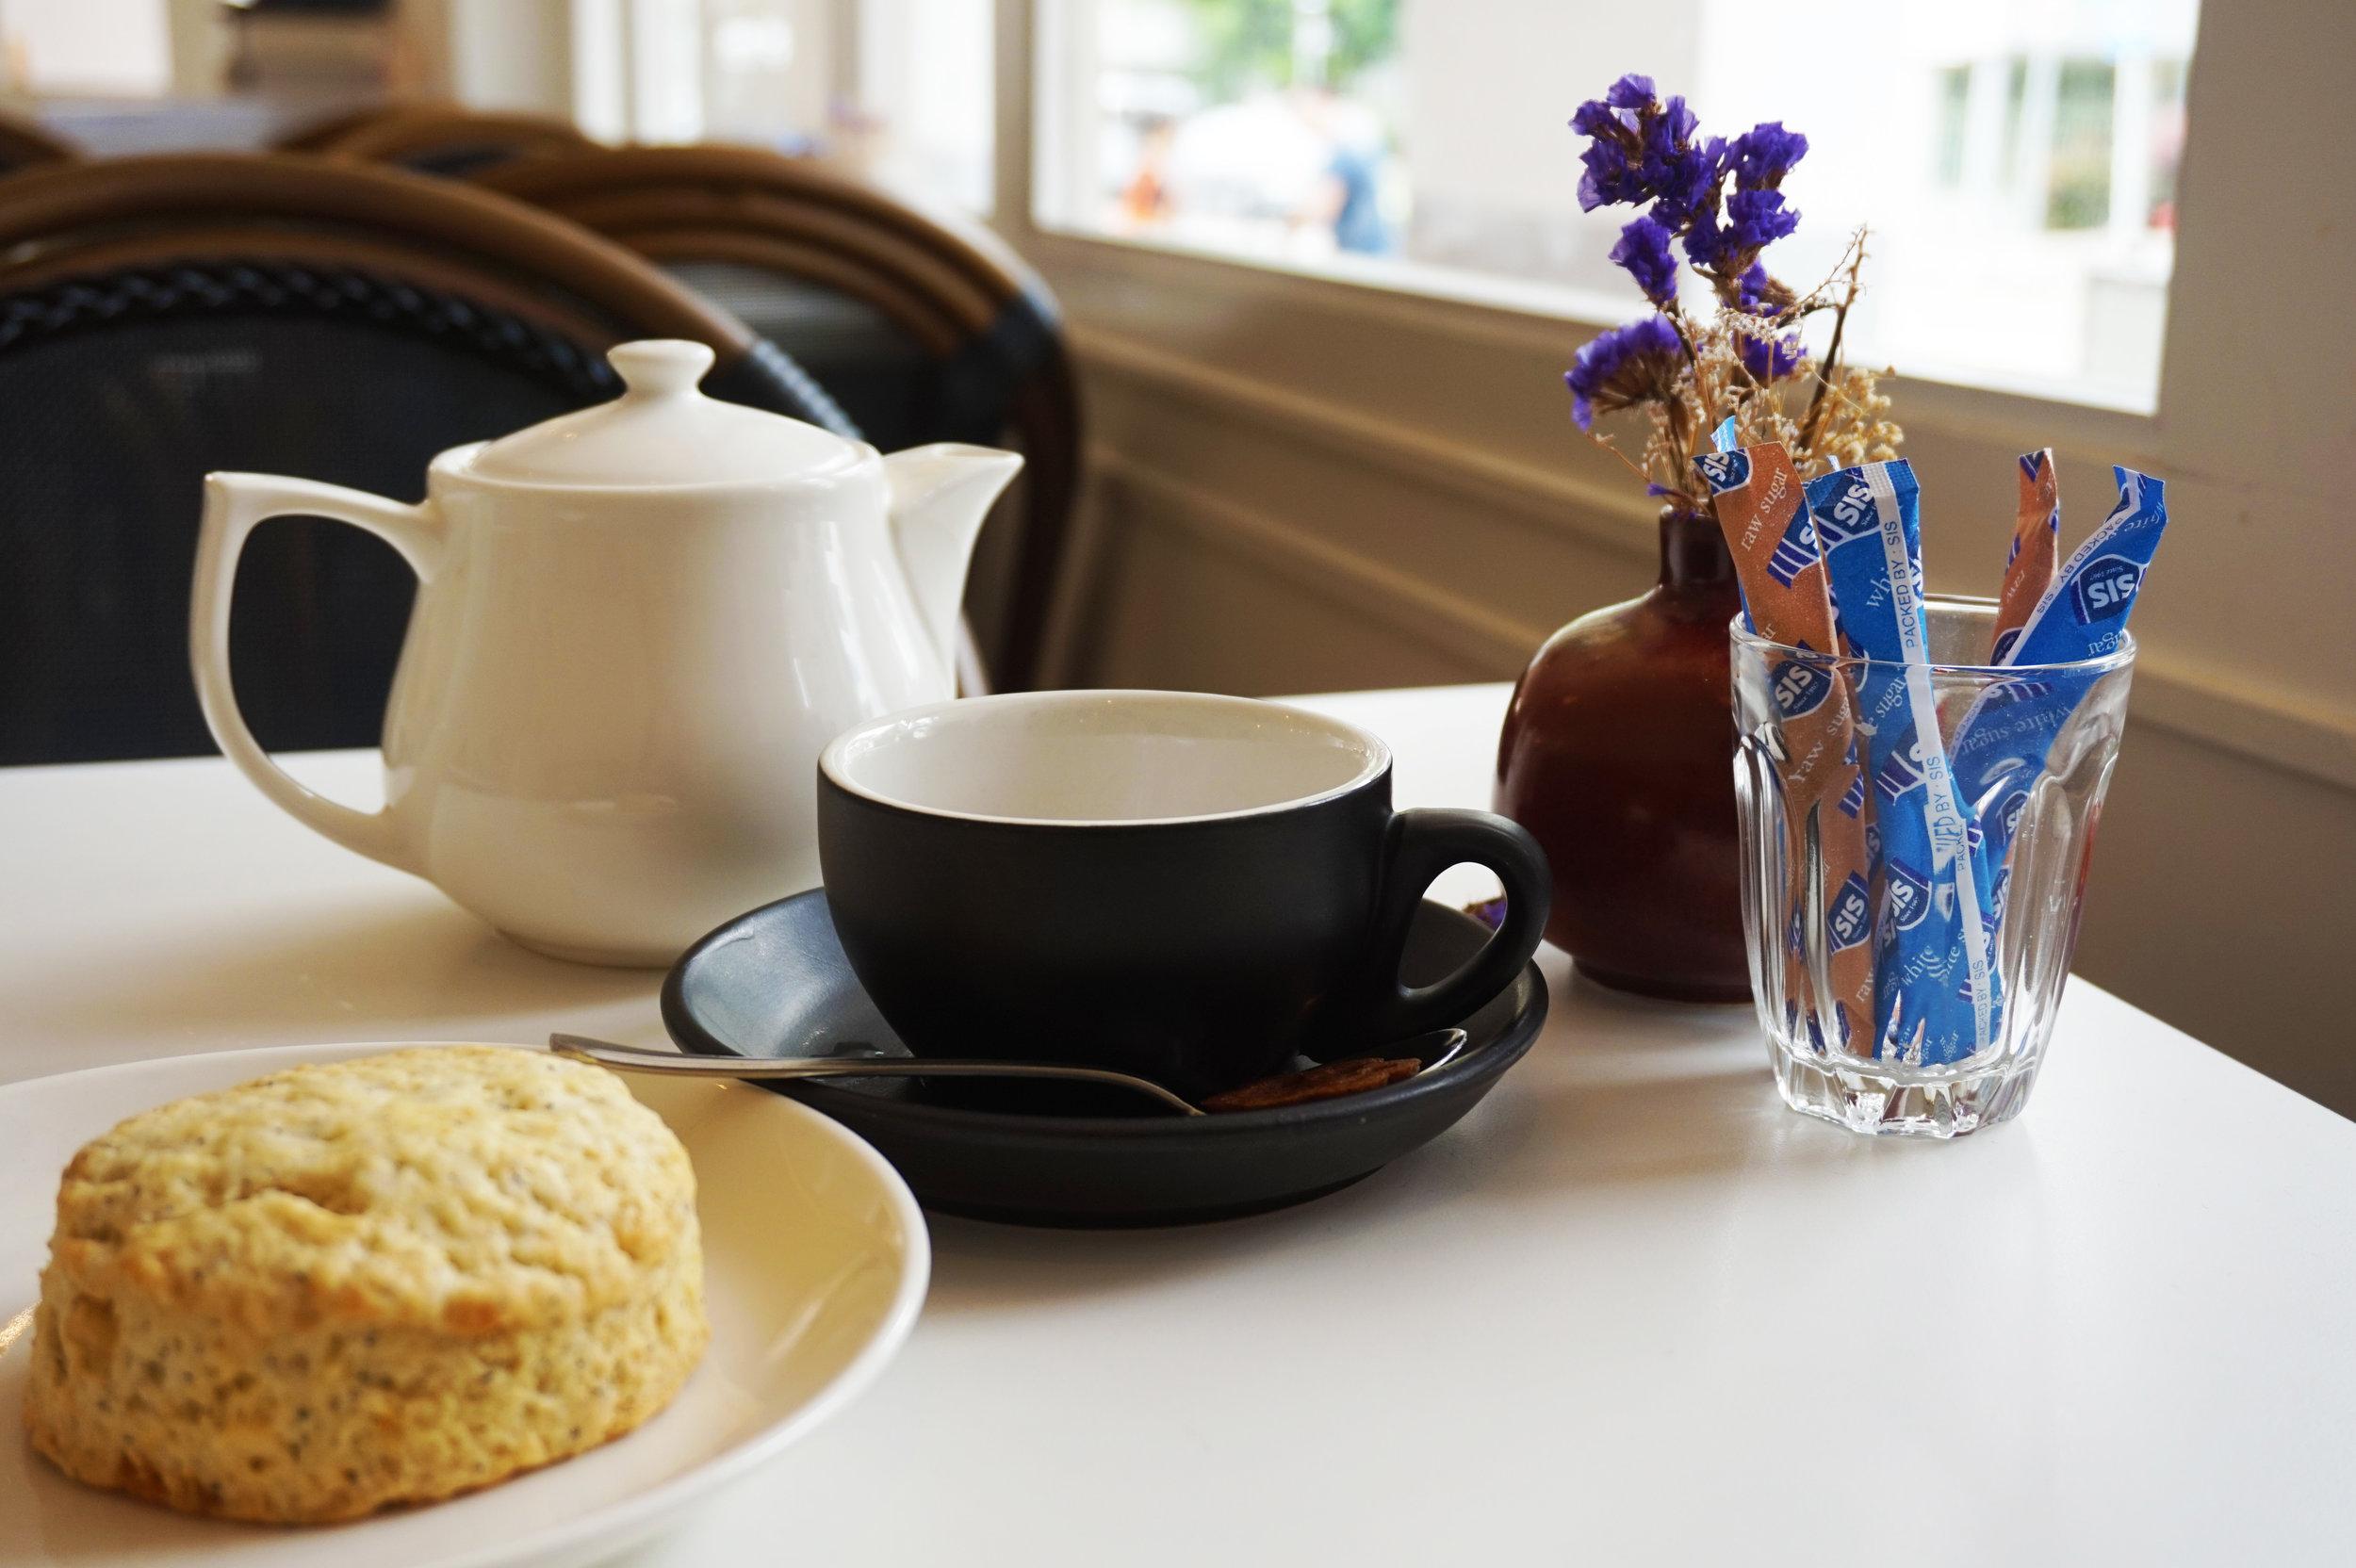 Earl Grey scone and jasmine tea from Whisk Café